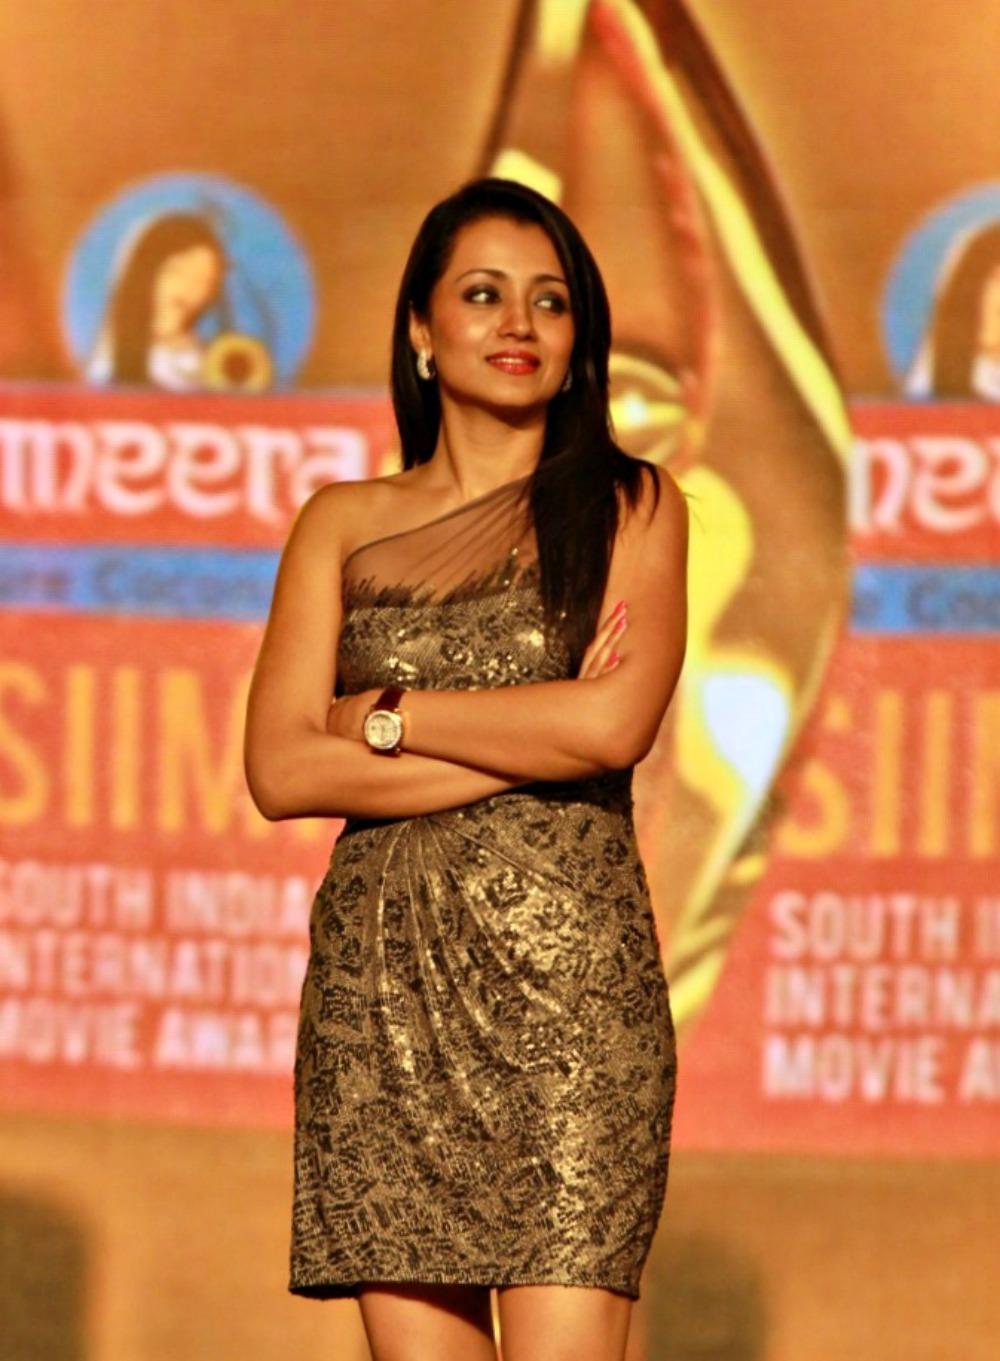 Trisha Krishnan - Stránka 5 Tumblr_m6ptvtqTHD1qko52zo1_1280